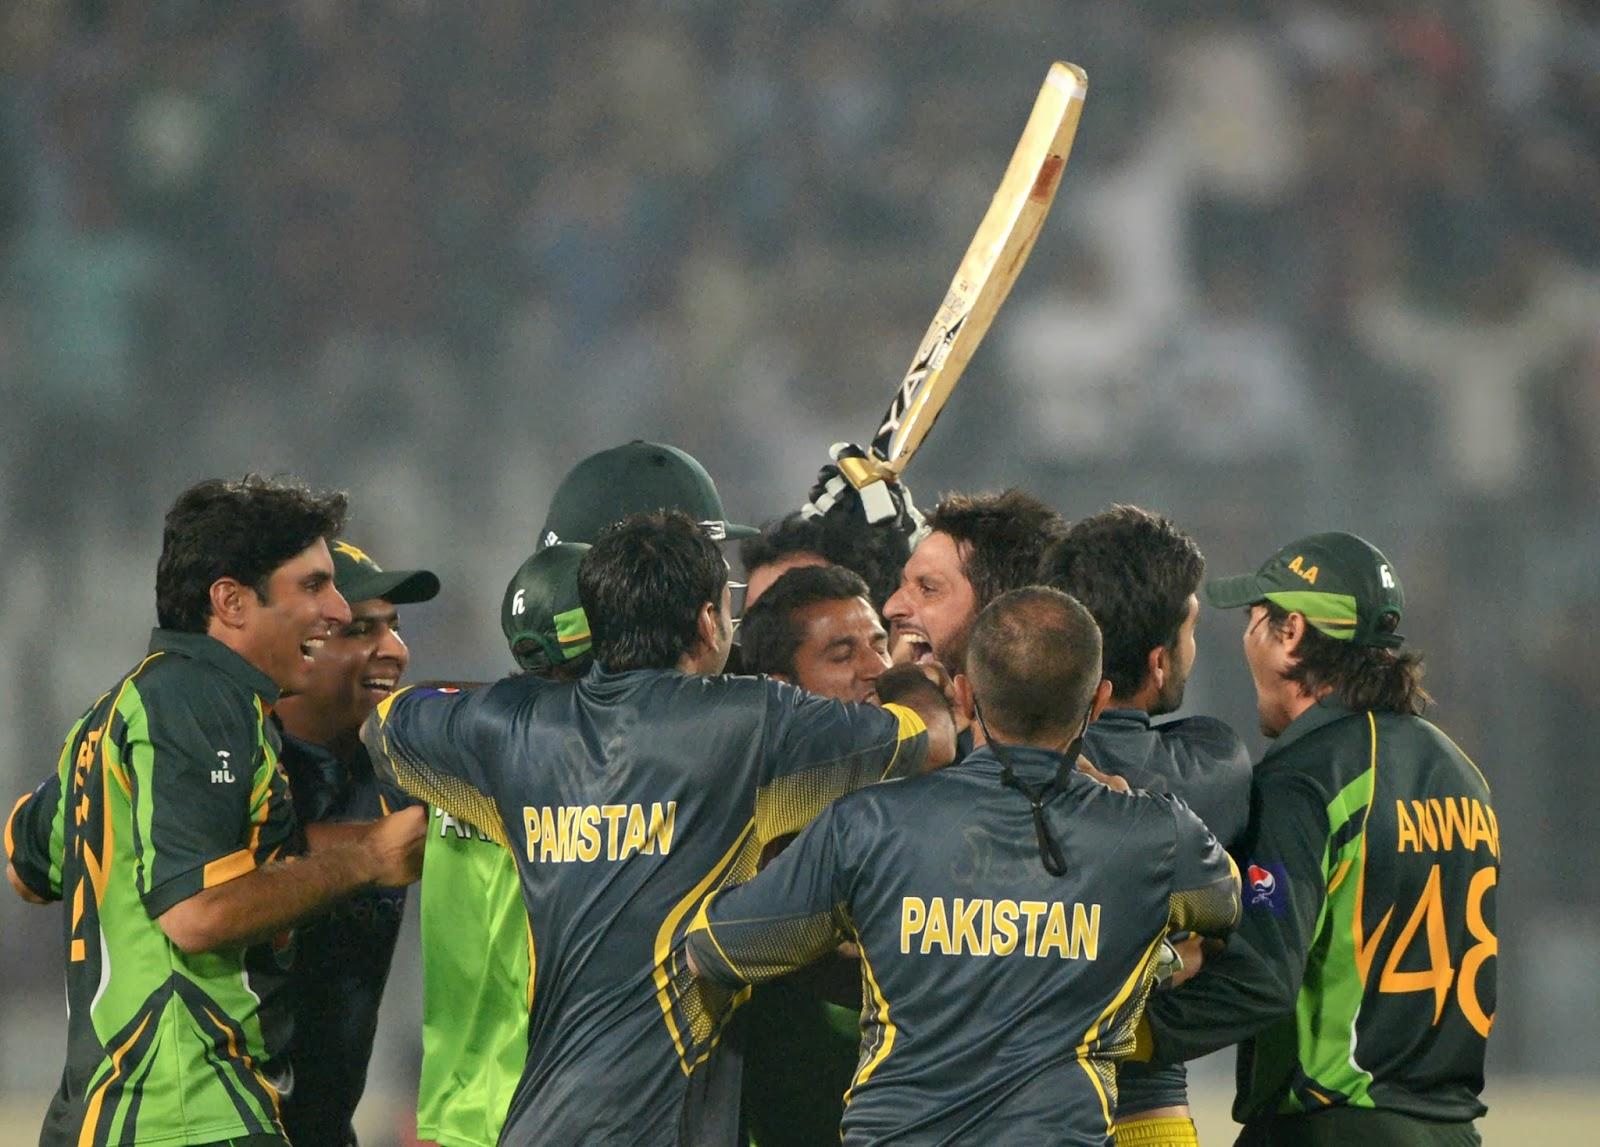 6th Match, Ashwin, Asia Cup, Asia Cup 2014, Bangladesh, Captain, Cricket, Dhaka, India, Misbah ul Haq, Pakistan, Pakistan vs India, Shahid Afridi, Sports, Virat Kohli, Winner, World Cup champions, Hafeez, Man of the Match